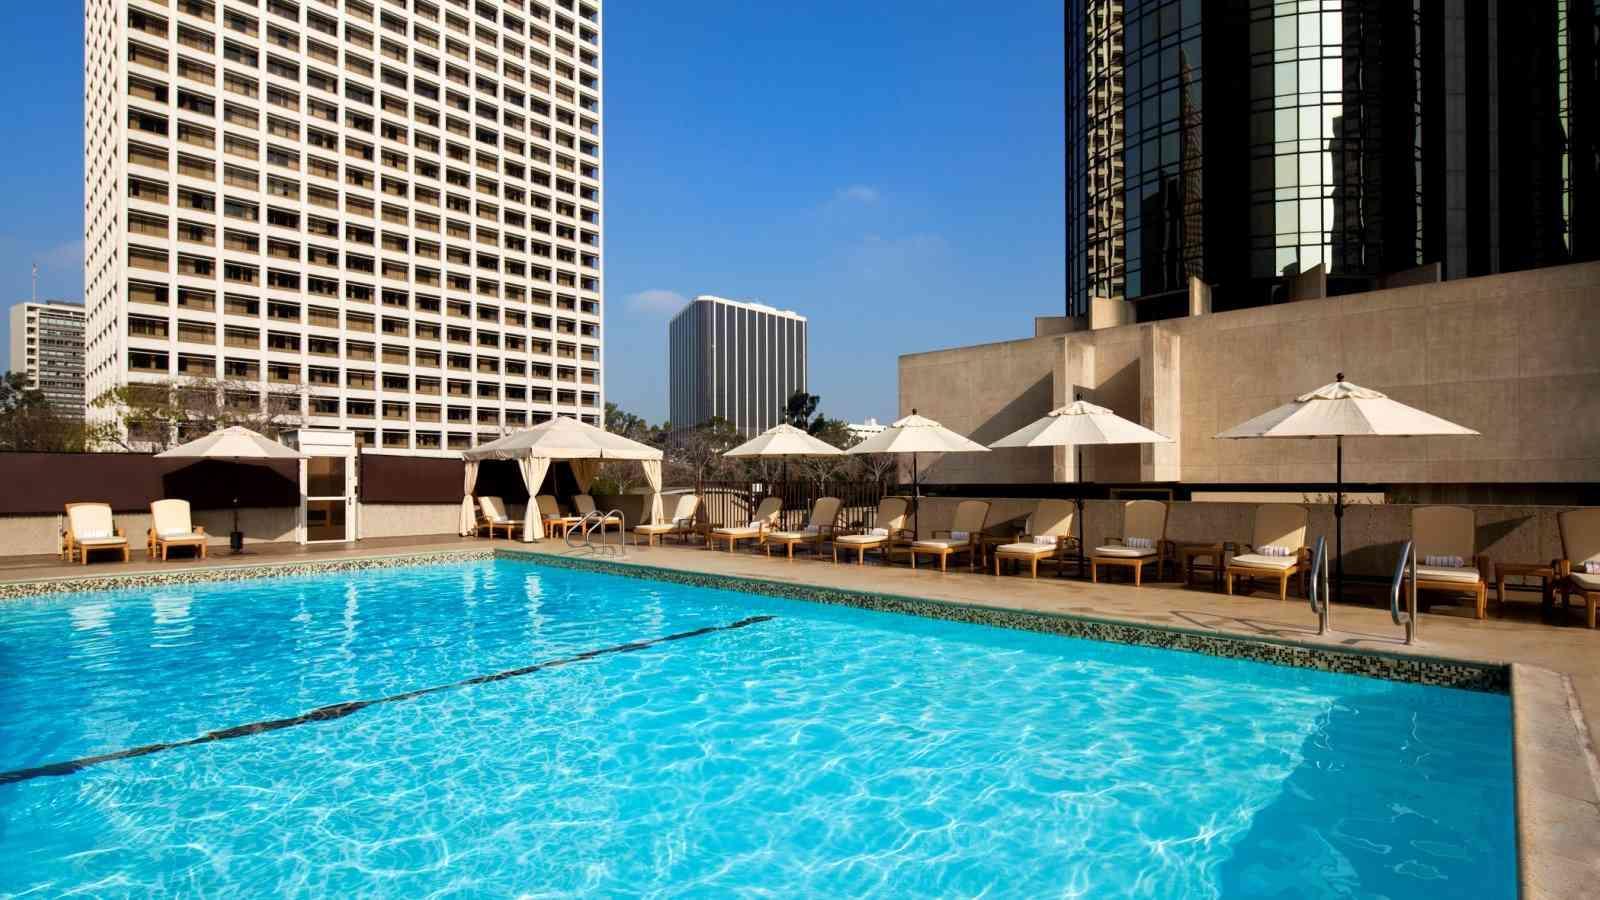 Holidays at Westin Bonaventure Hotel & Suites in Los Angeles, California